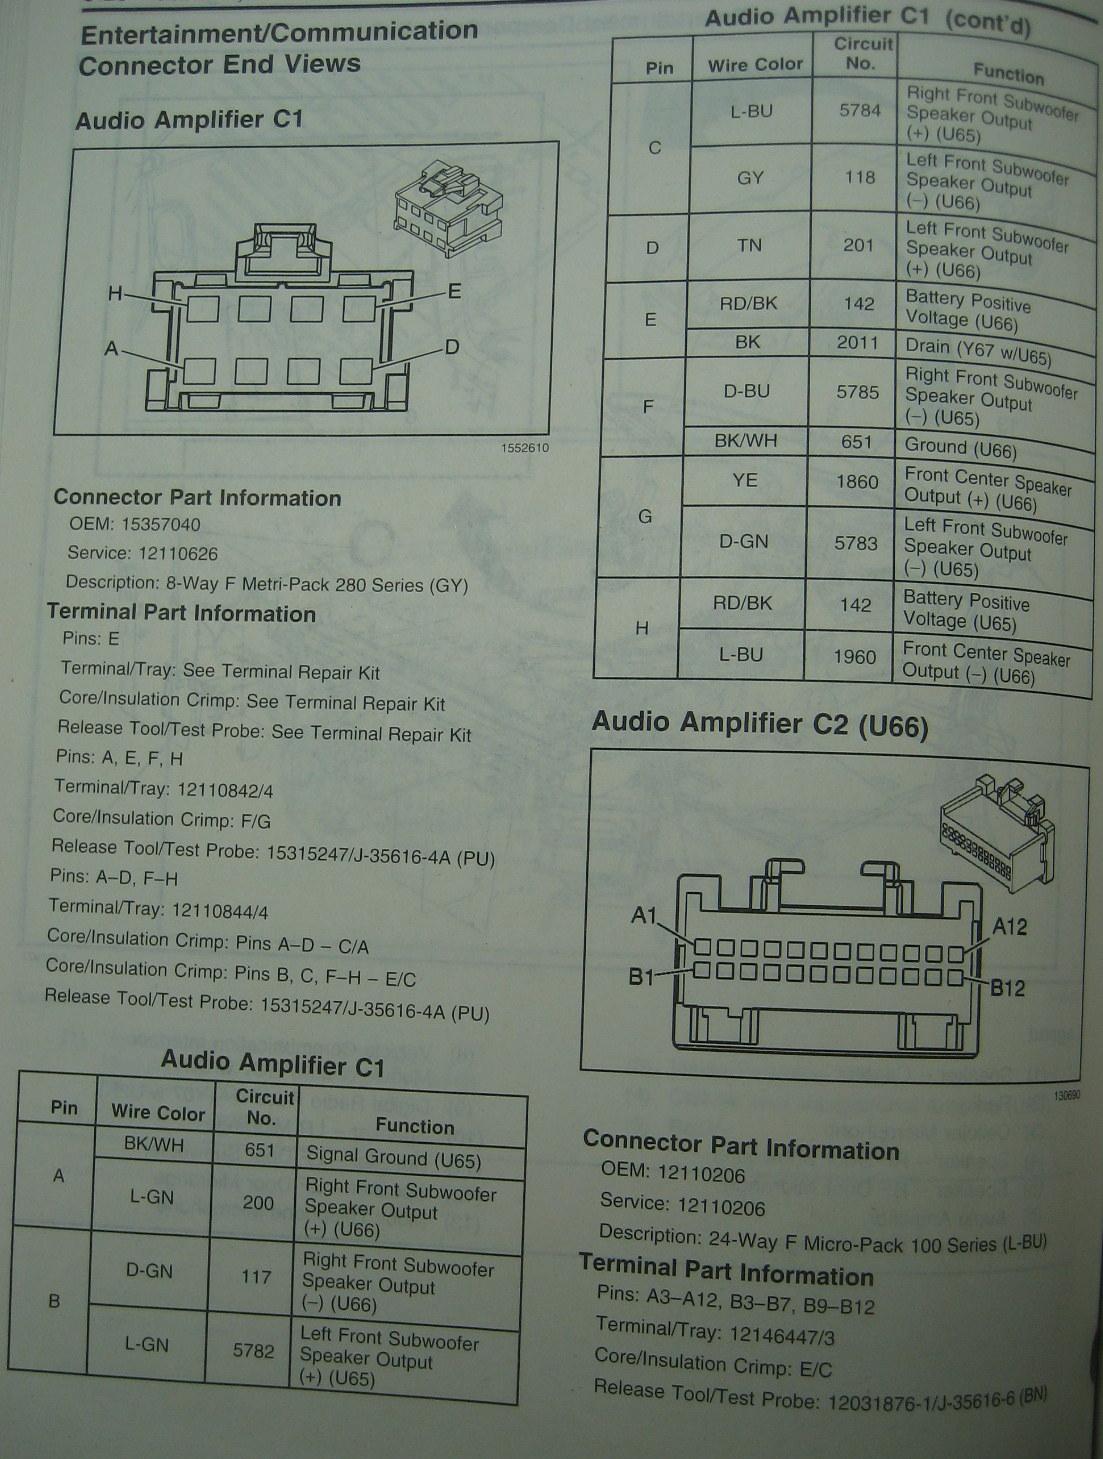 gm wiring diagrams for dummies jvc kd r650 car stereo diagram c pal installation 2007 z06